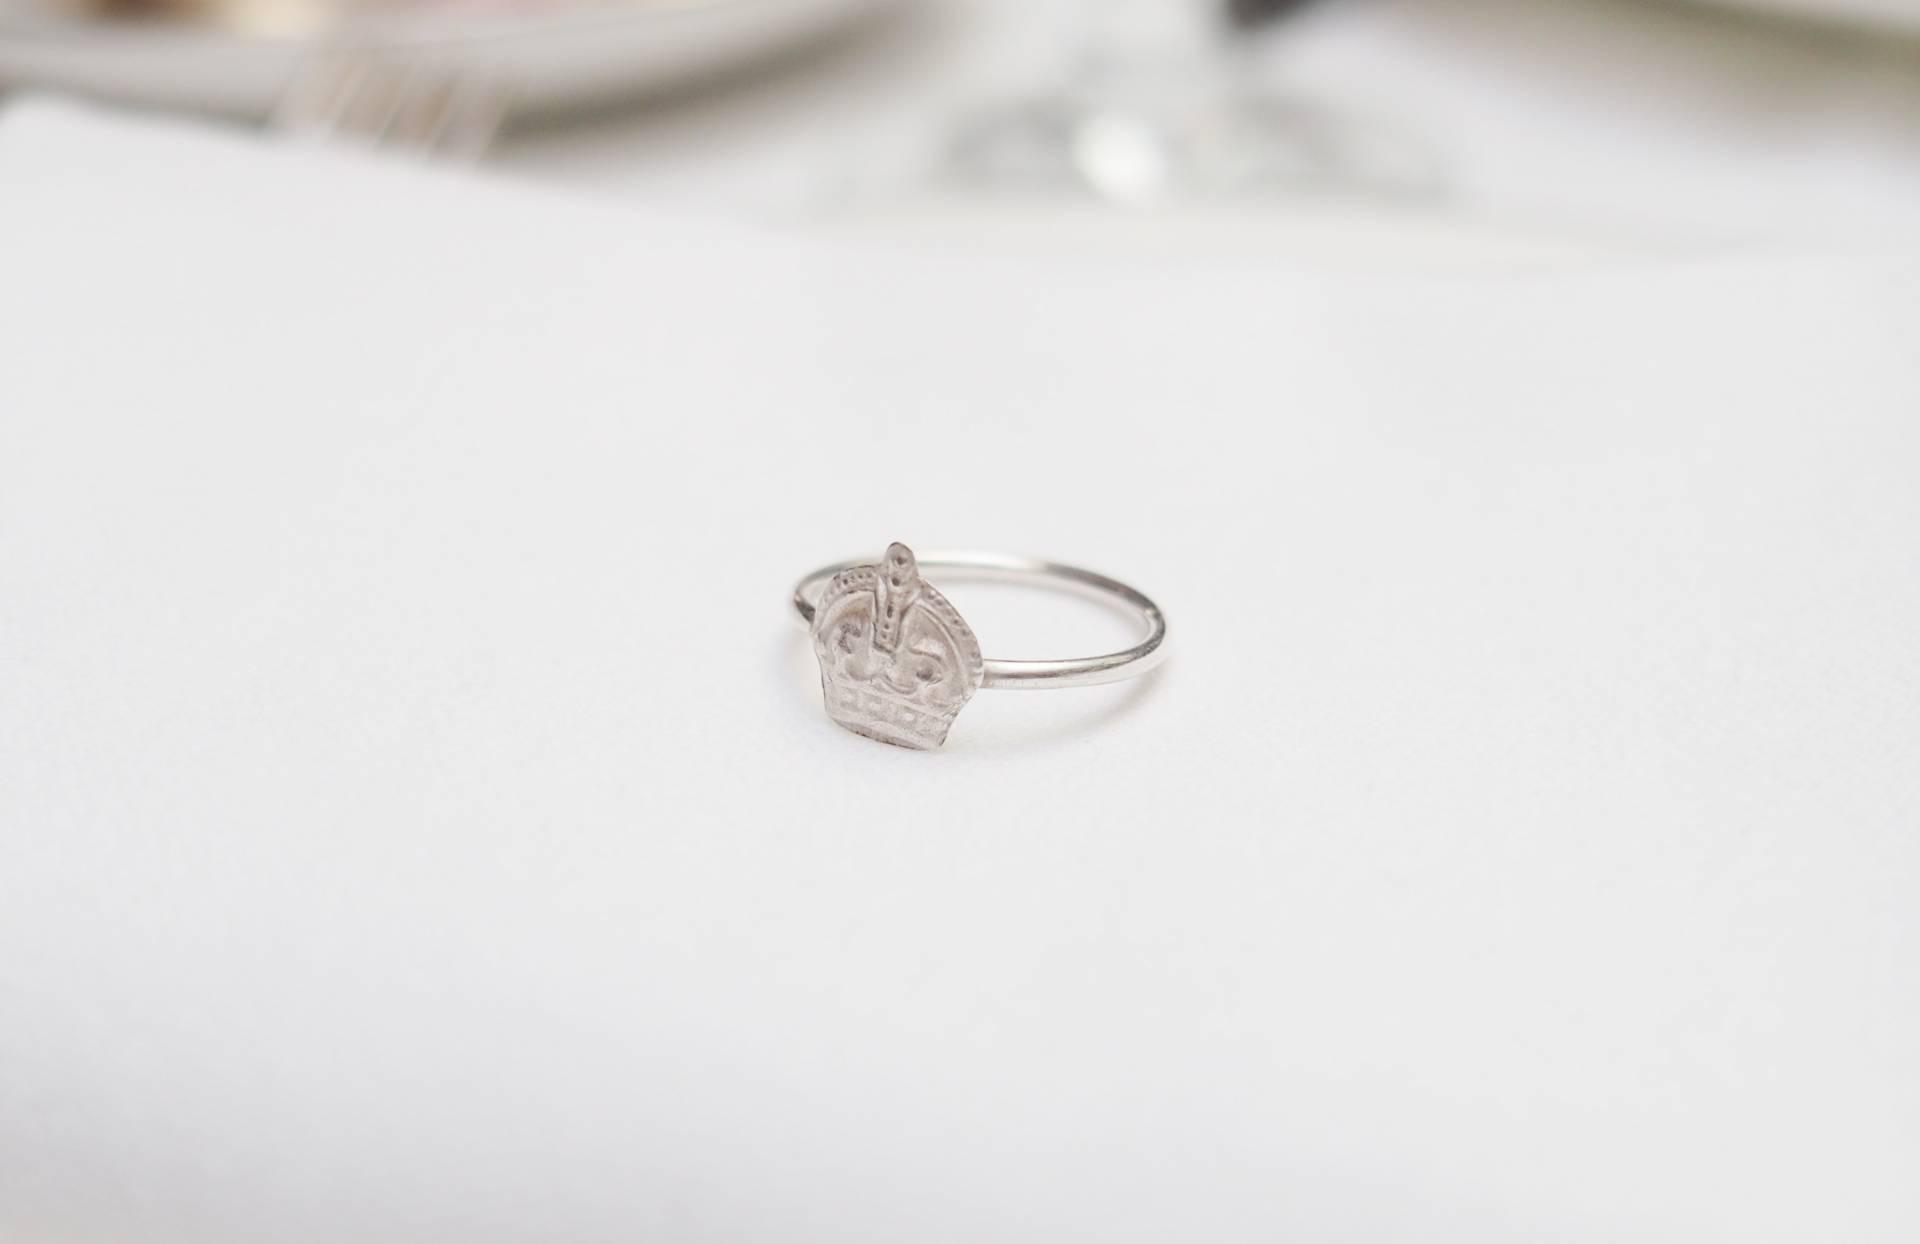 pip jolley ring